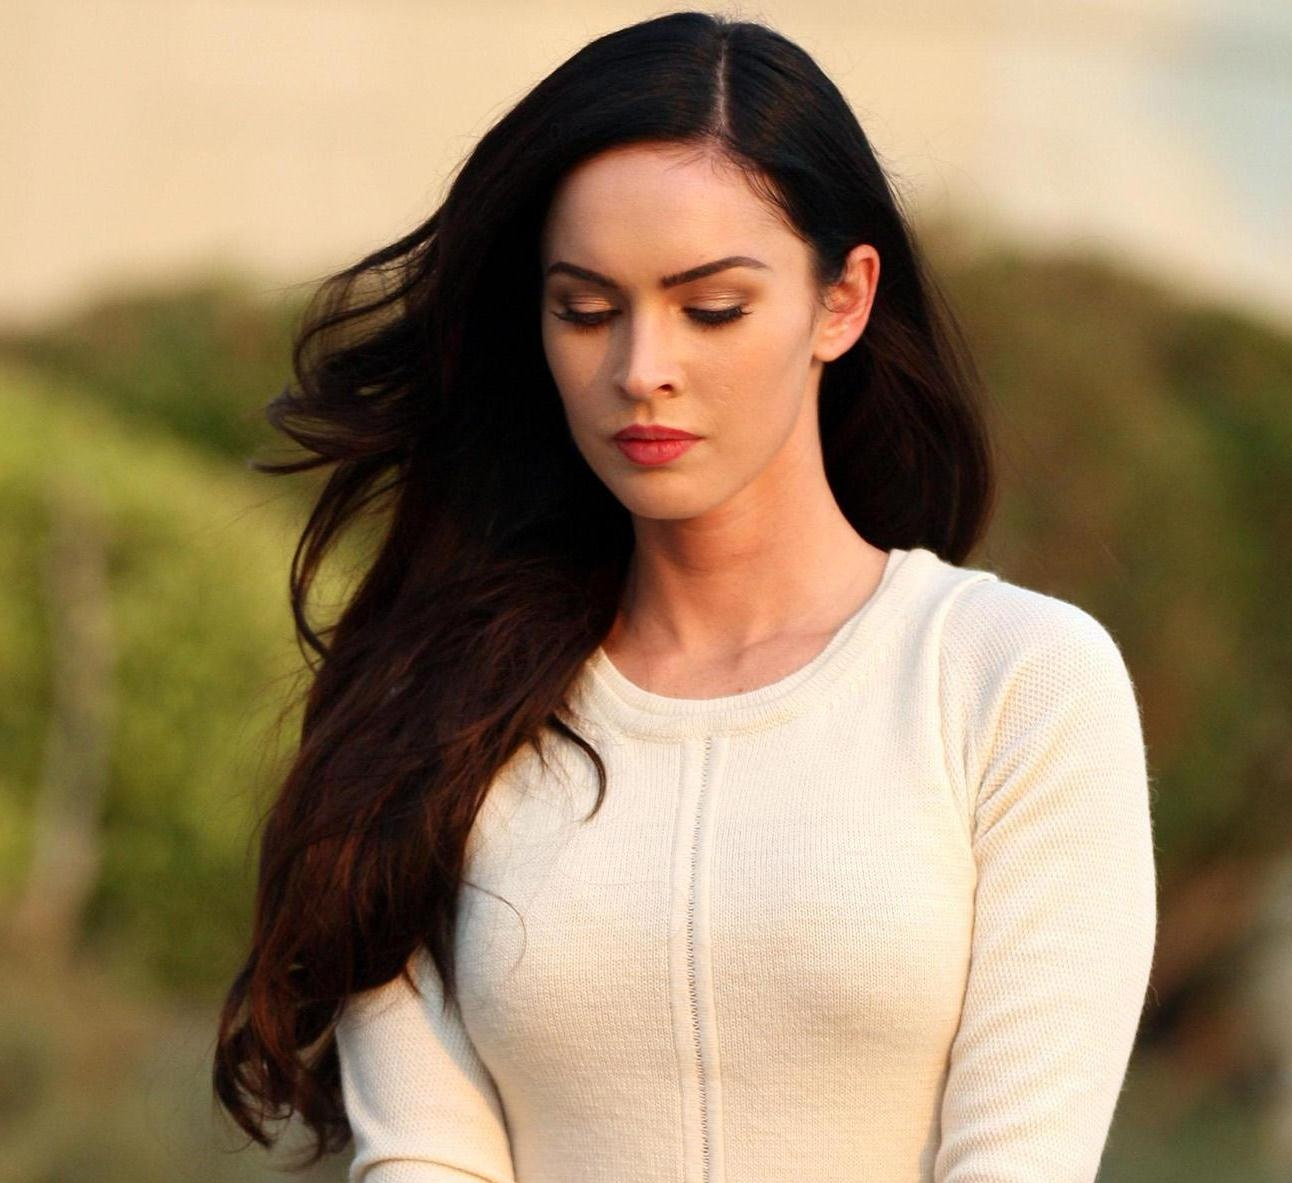 Megan Fox: Actress Pictures: Megan Fox